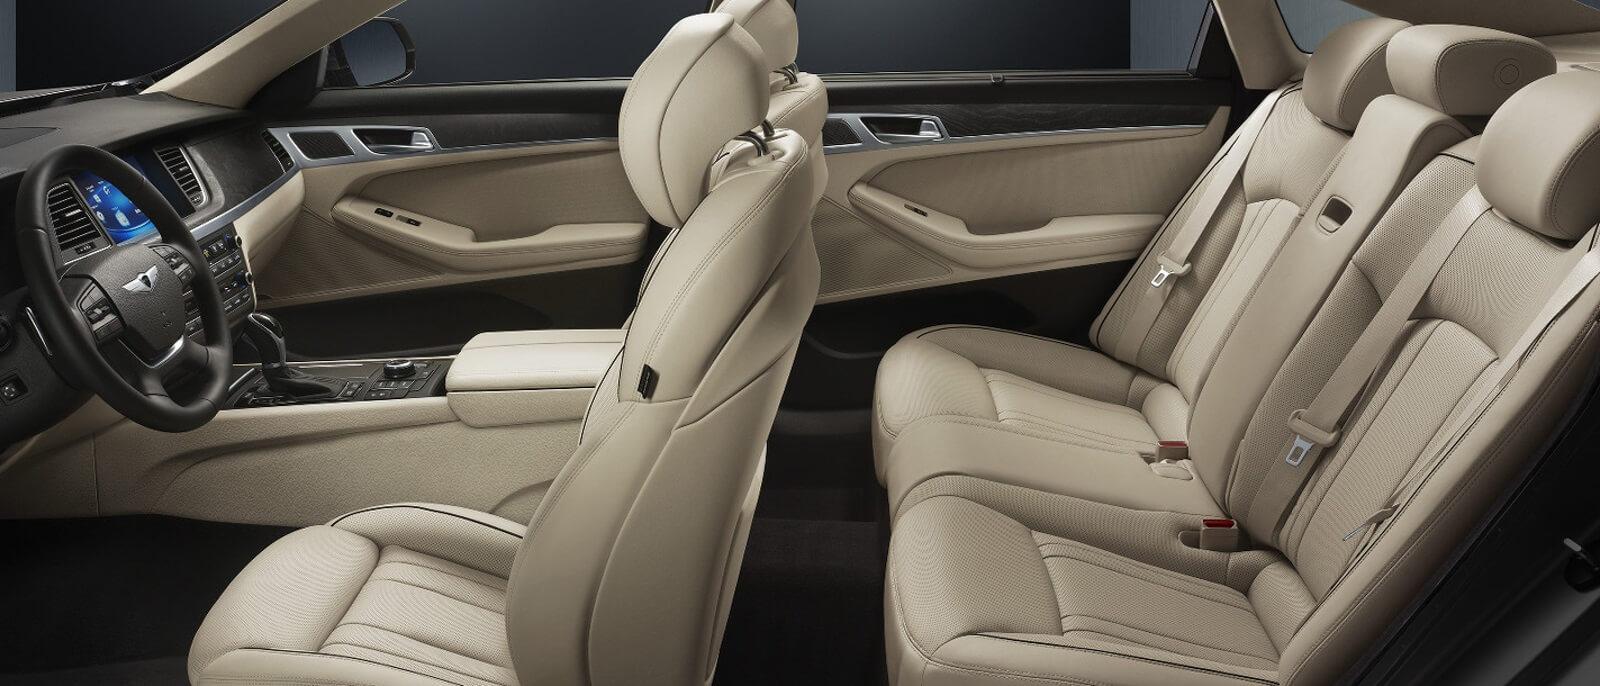 2015 hyundai genesis billings lockwood underriner 2016 Hyundai Genesis Interior Colors 2015 hyundai genesis interior